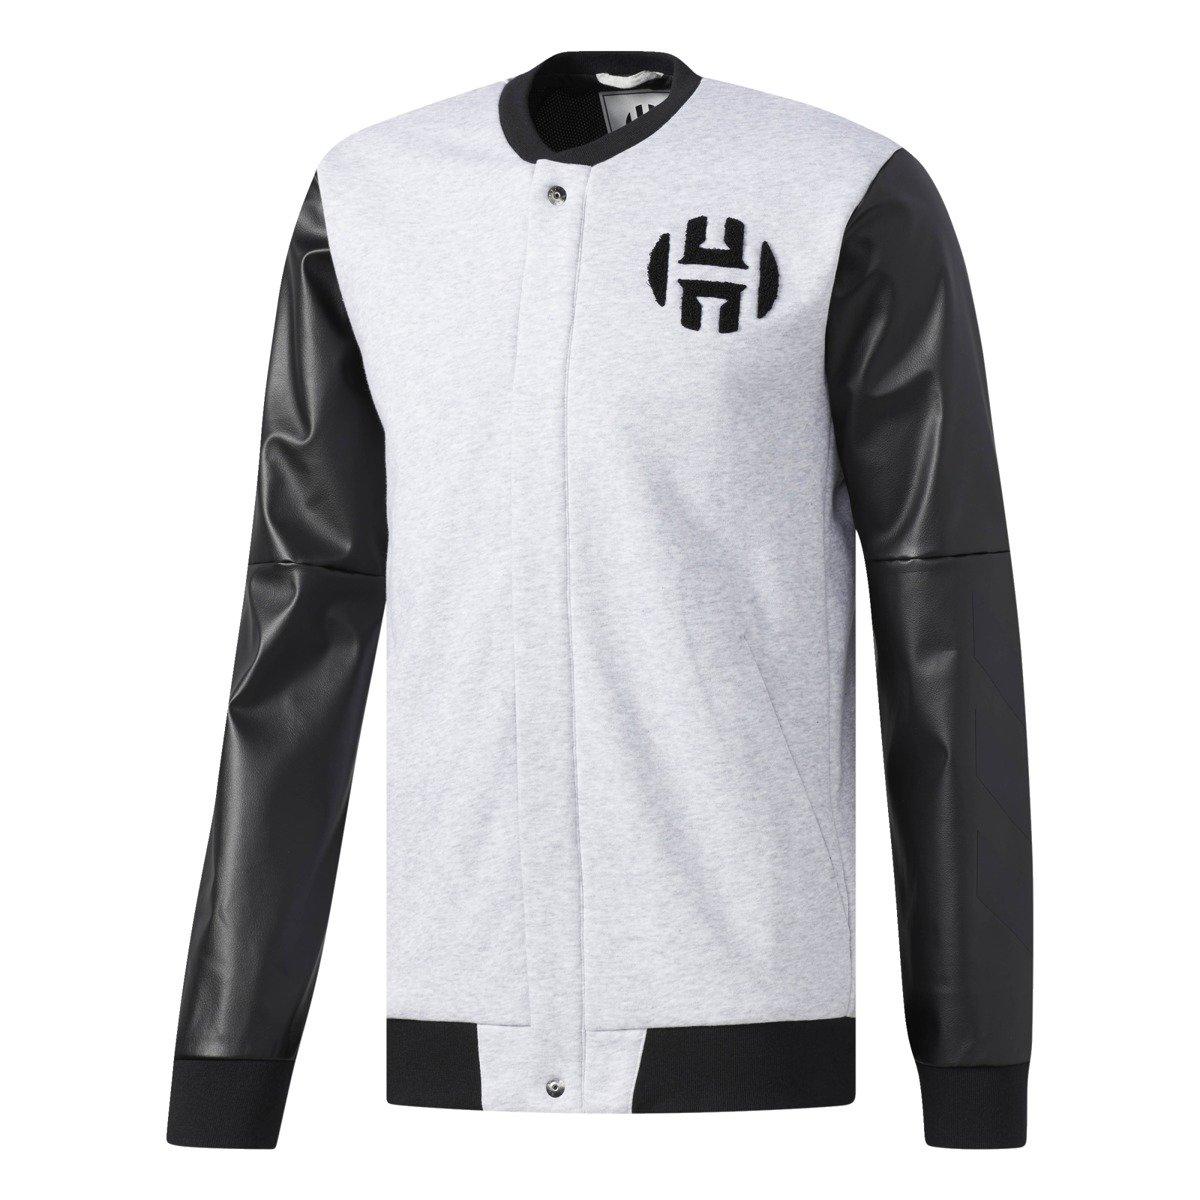 quality design b84c5 9cc3b adidas James Harden Varsity NBA houston Rocket Jacket - CE4707